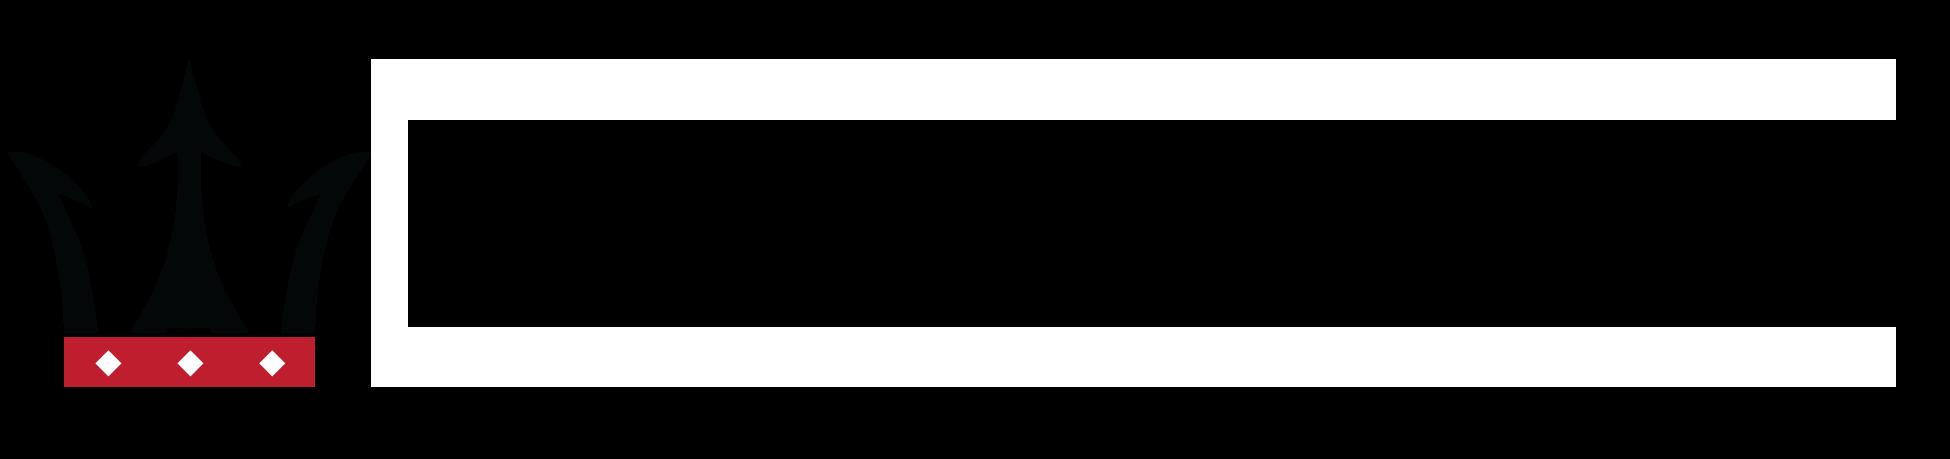 Mastuhree Brand, LLC